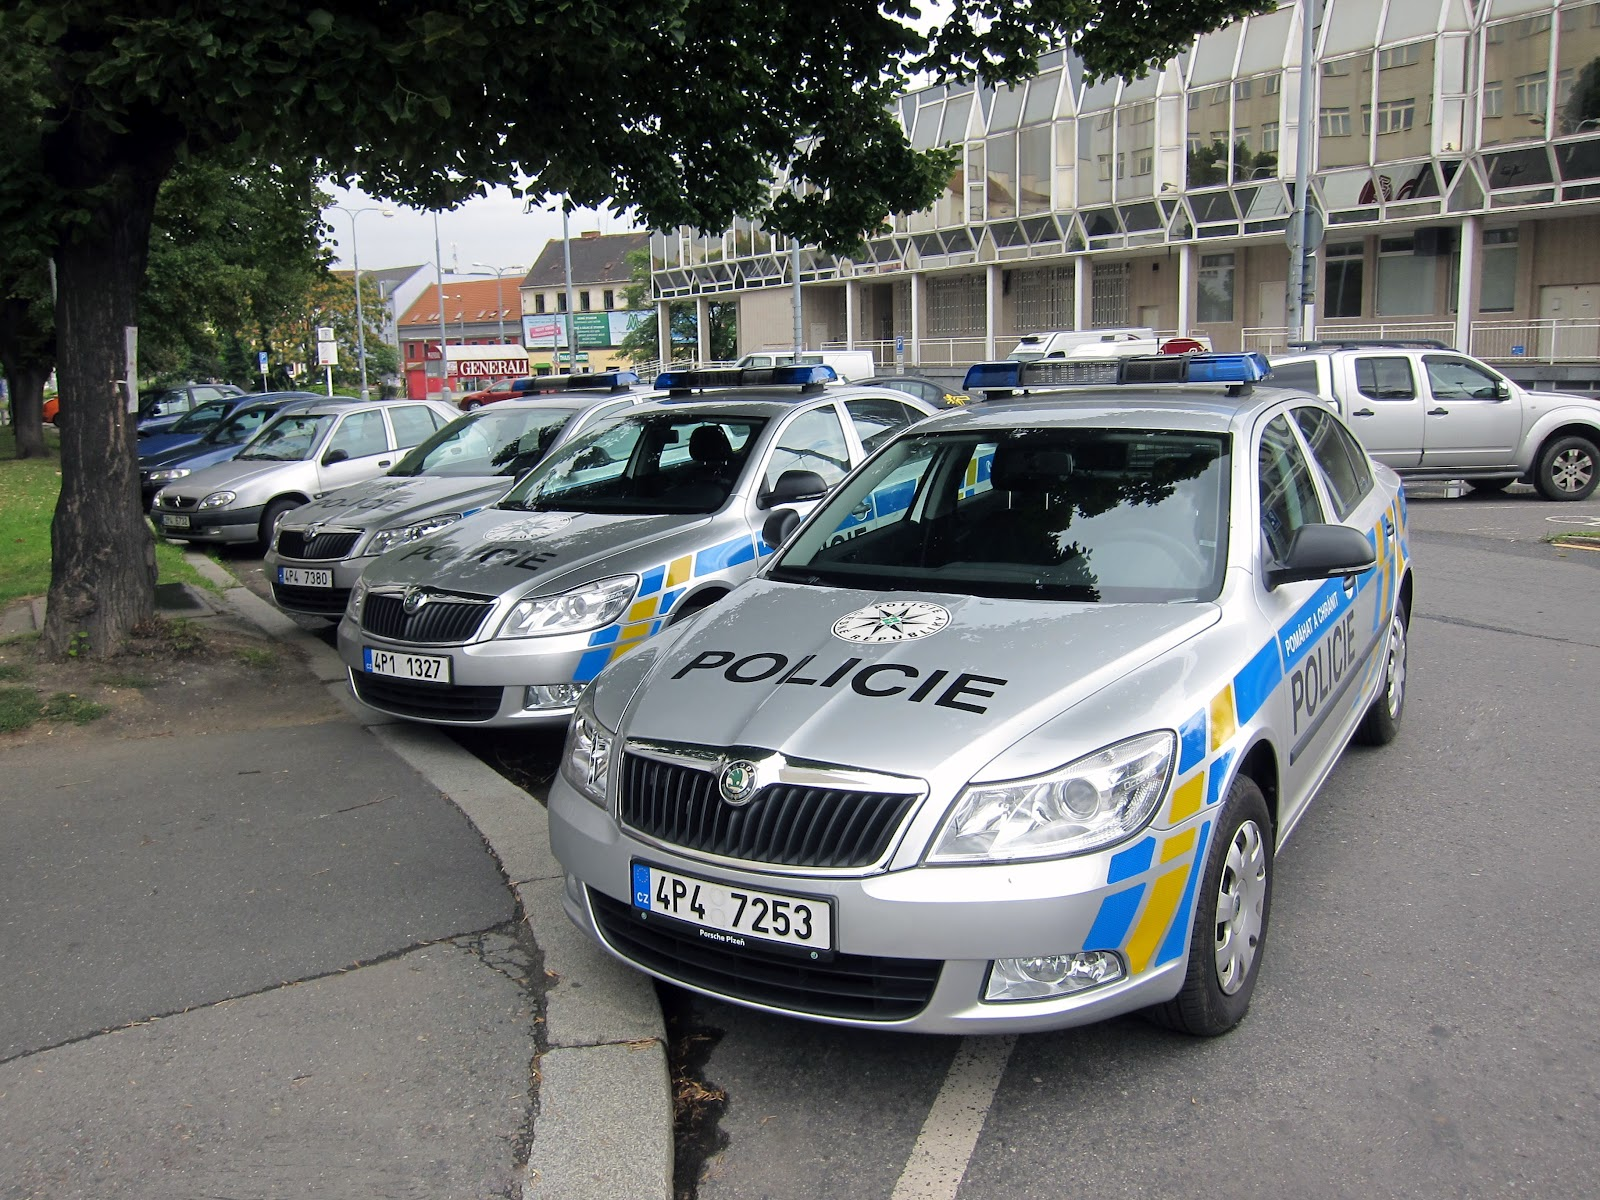 Auto Sale Czech Republic: Transpress Nz: New Skoda Police Cars, Pilsen, Czech Republic